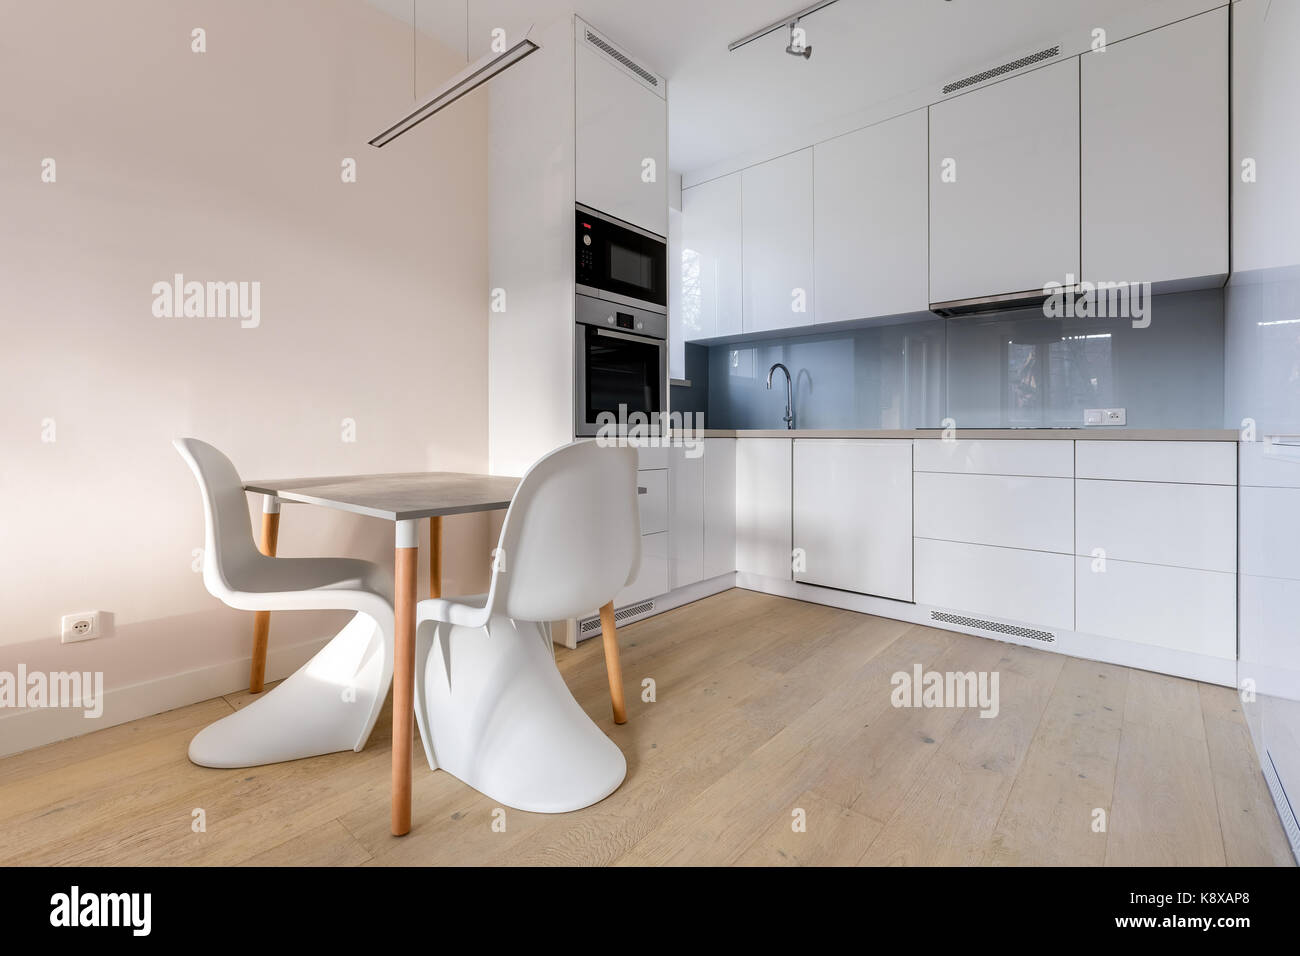 Washbasin White Stockfotos & Washbasin White Bilder - Seite 17 - Alamy